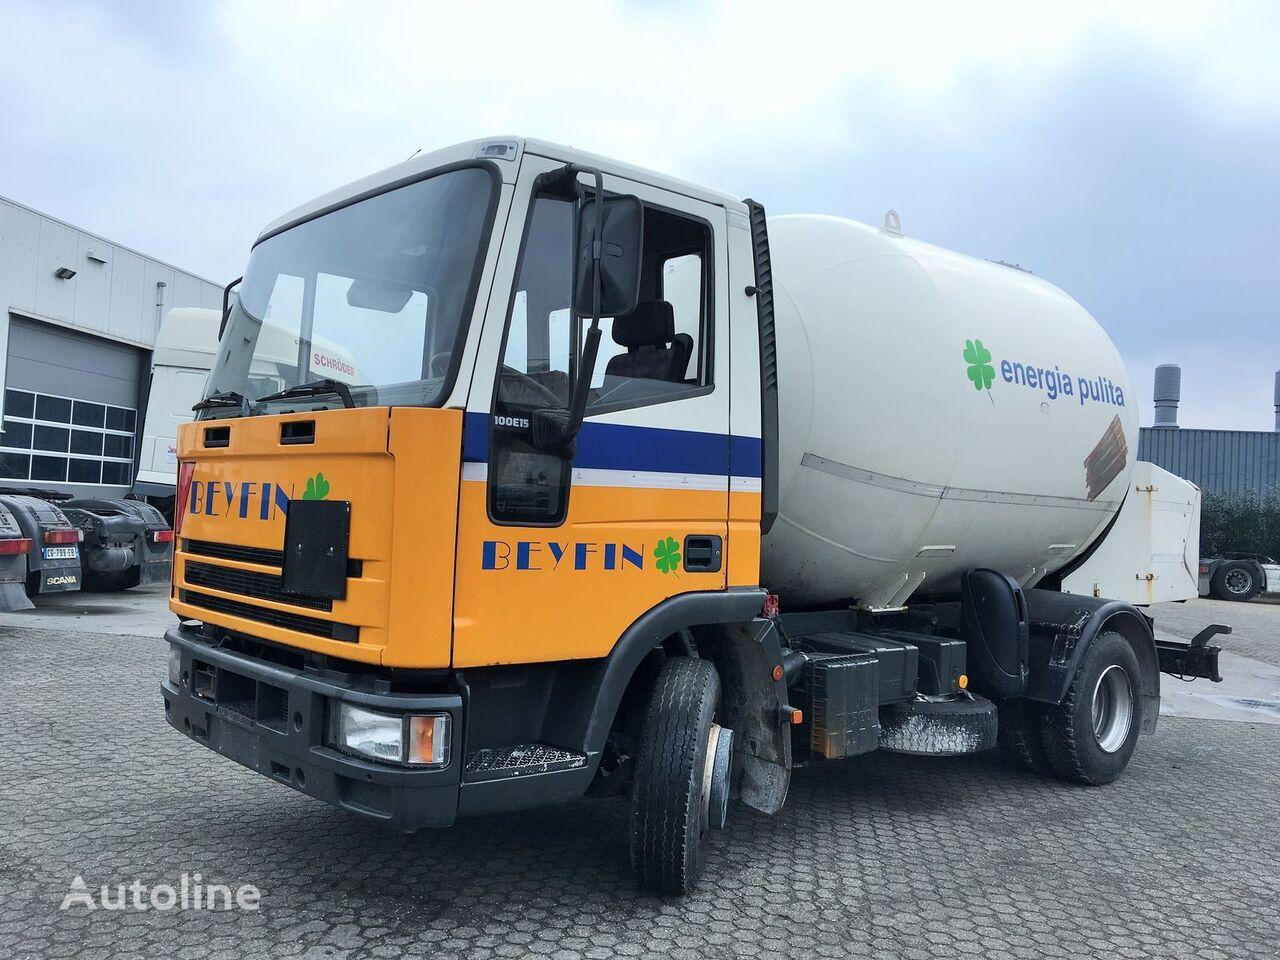 IVECO Iveco Gas - Gaz - ADR 2 - 10.000ltr - 27Bar - P27BH gas truck